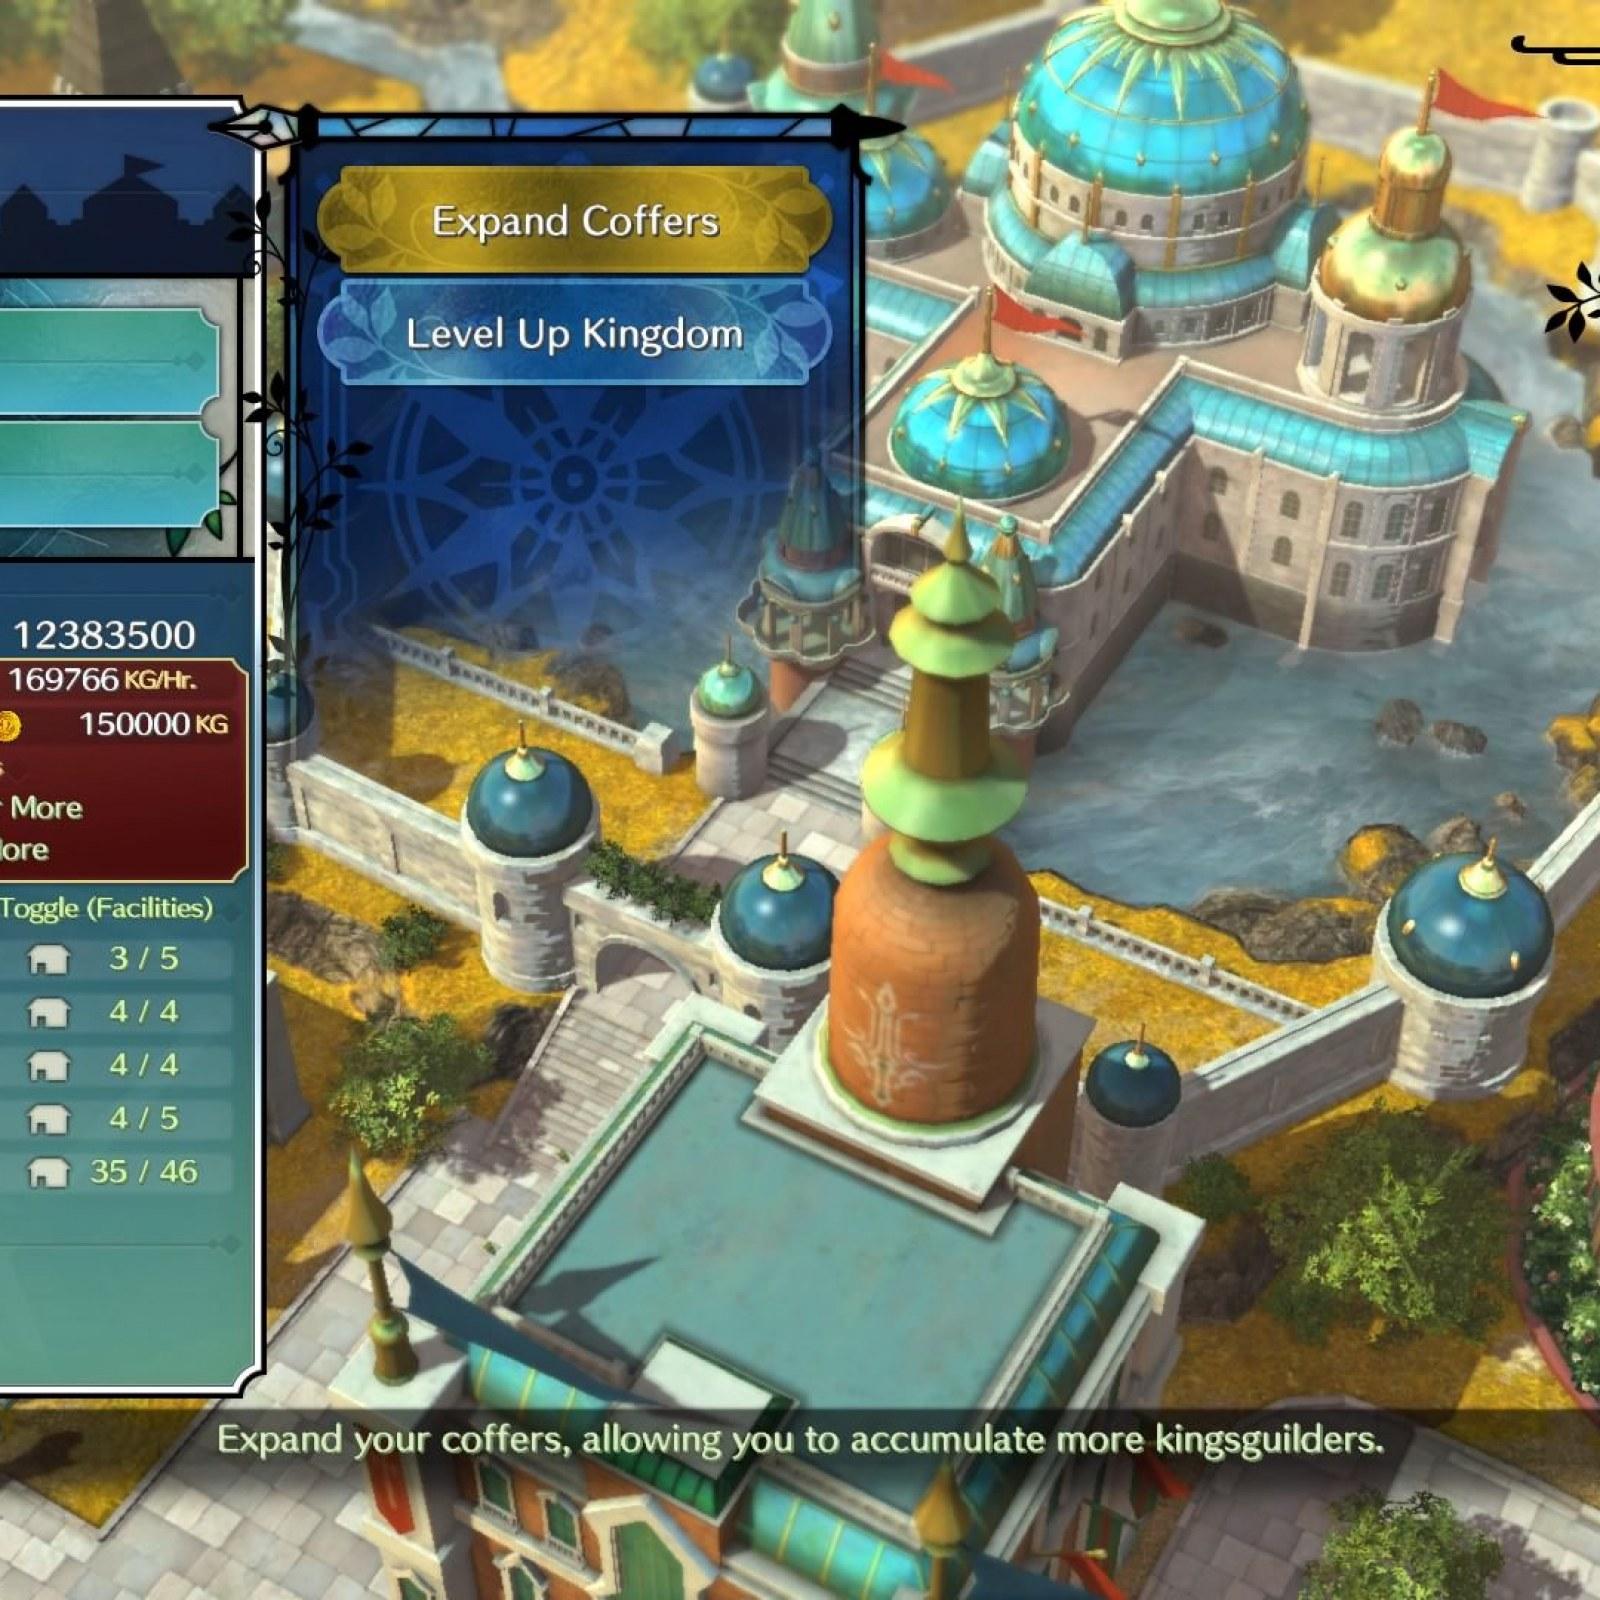 Ni No Kuni II' Kingdom Building Guide: The Best Research